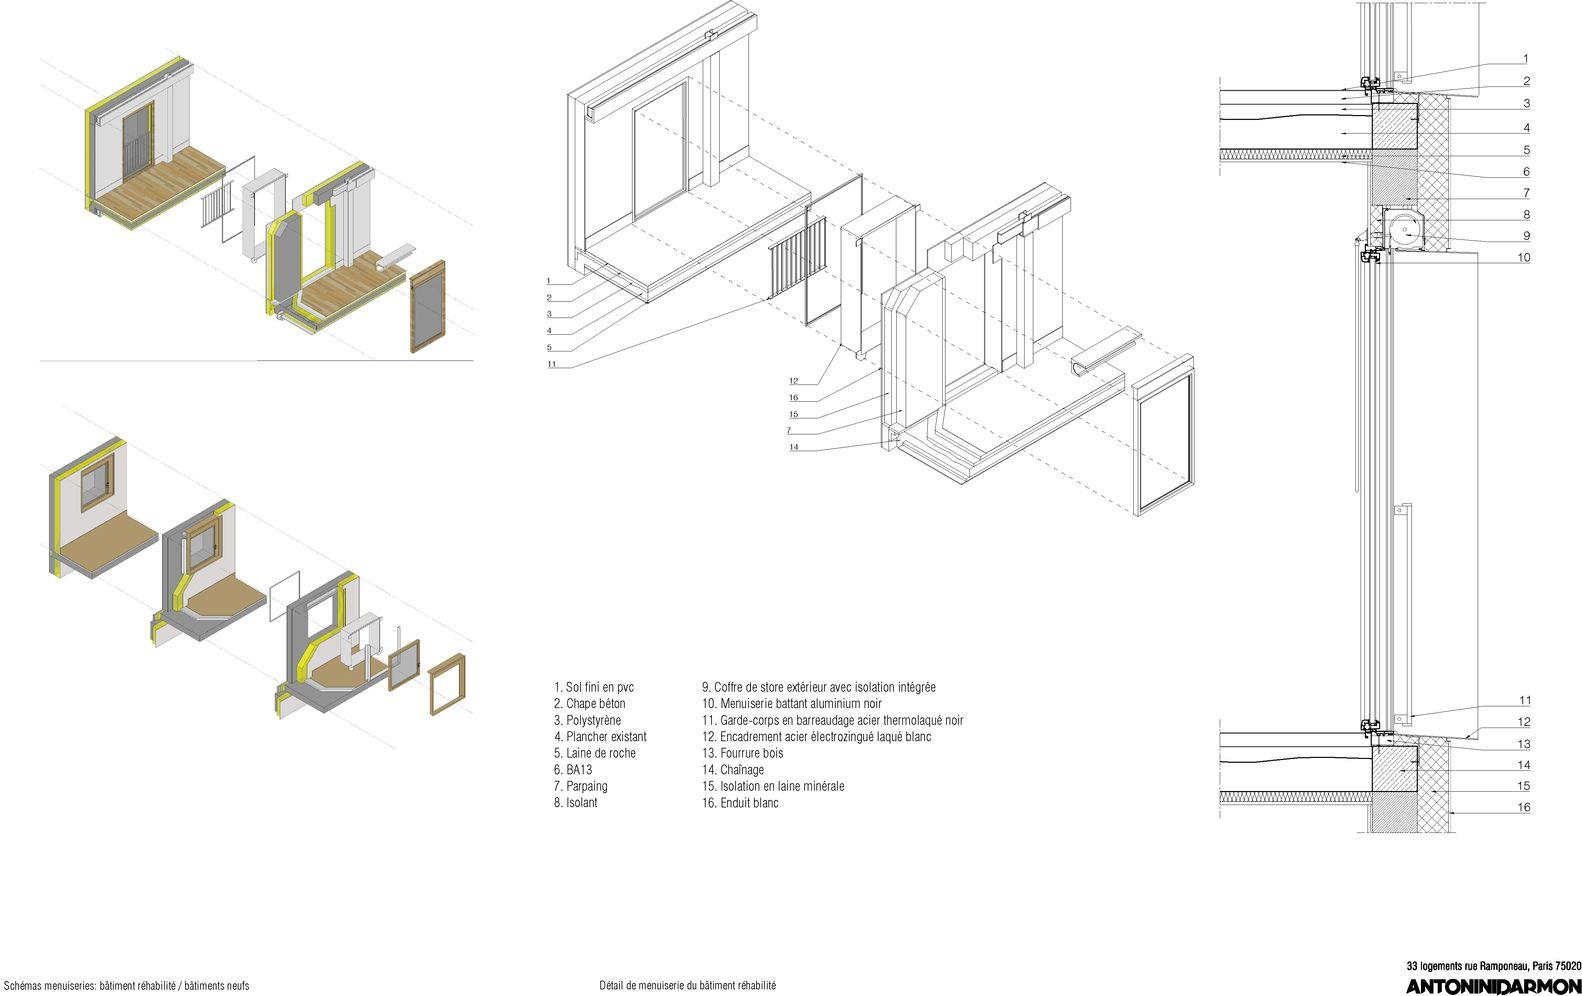 Gallery of 33 New and Rehabilitated Housing Units / Antonini + Darmon Architectes - 17